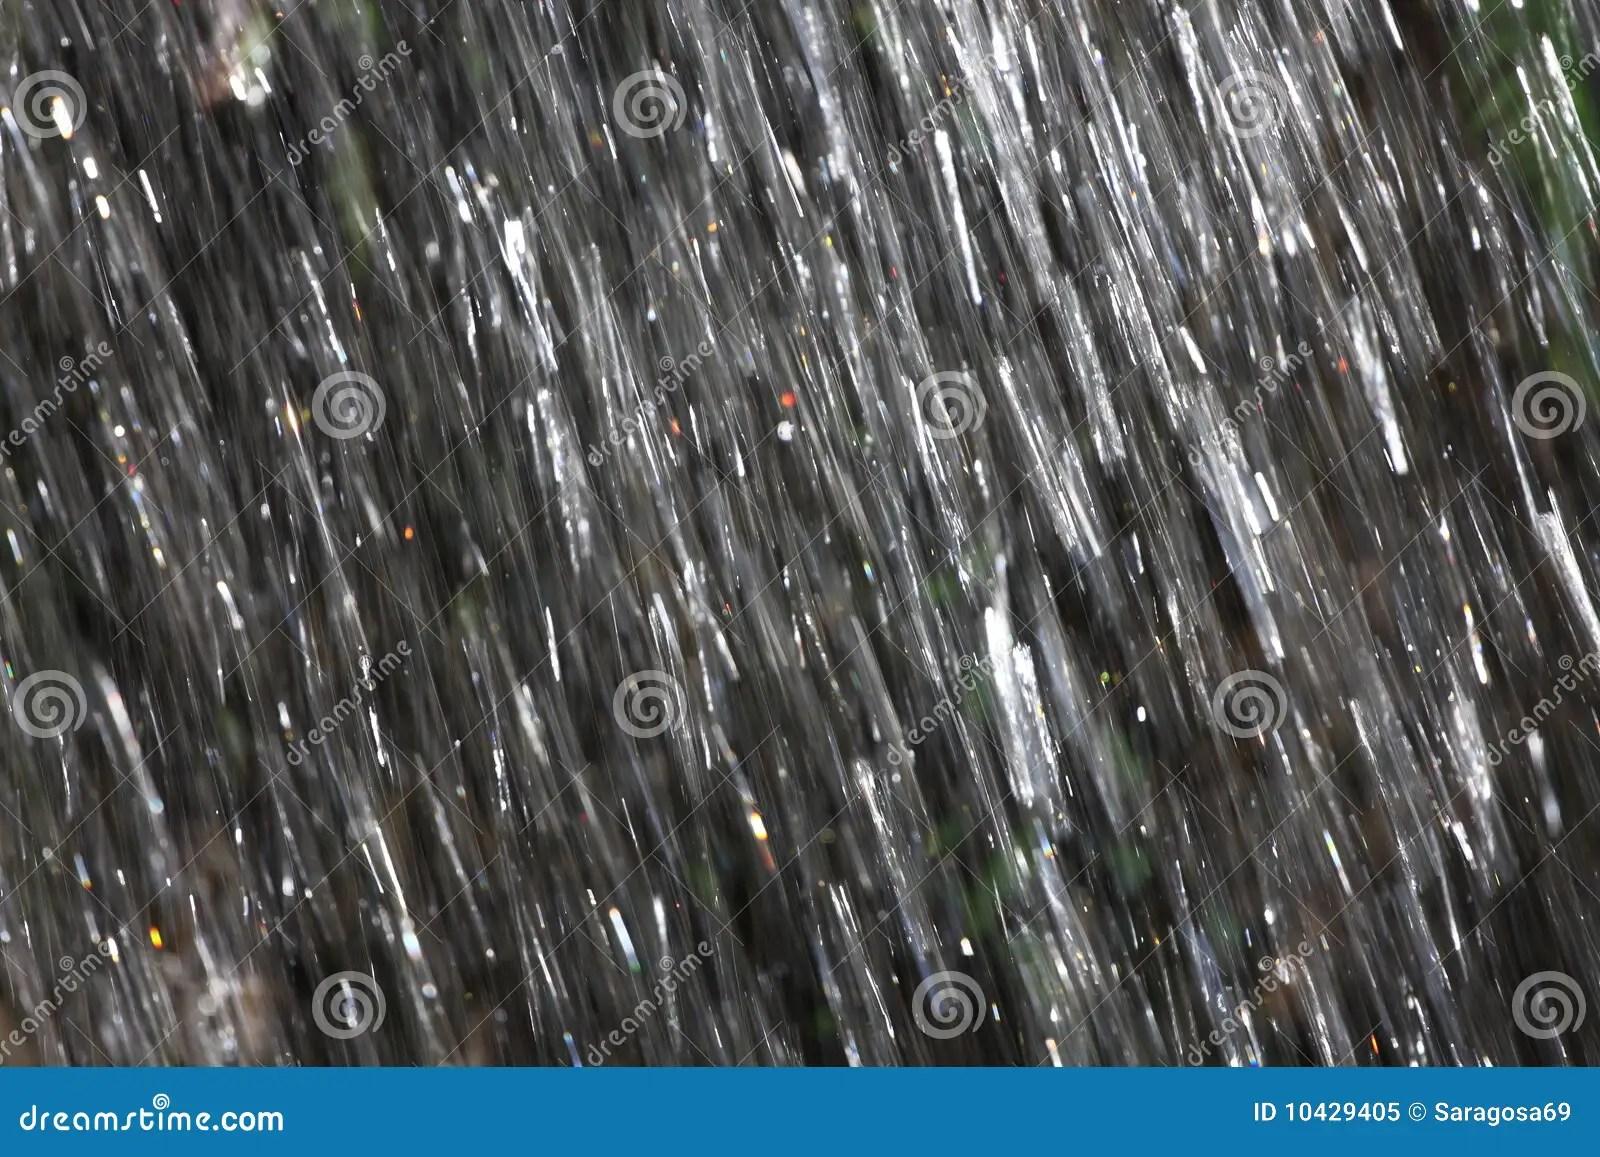 Rain Fall Hd Wallpaper Download Raining Royalty Free Stock Photo Image 10429405